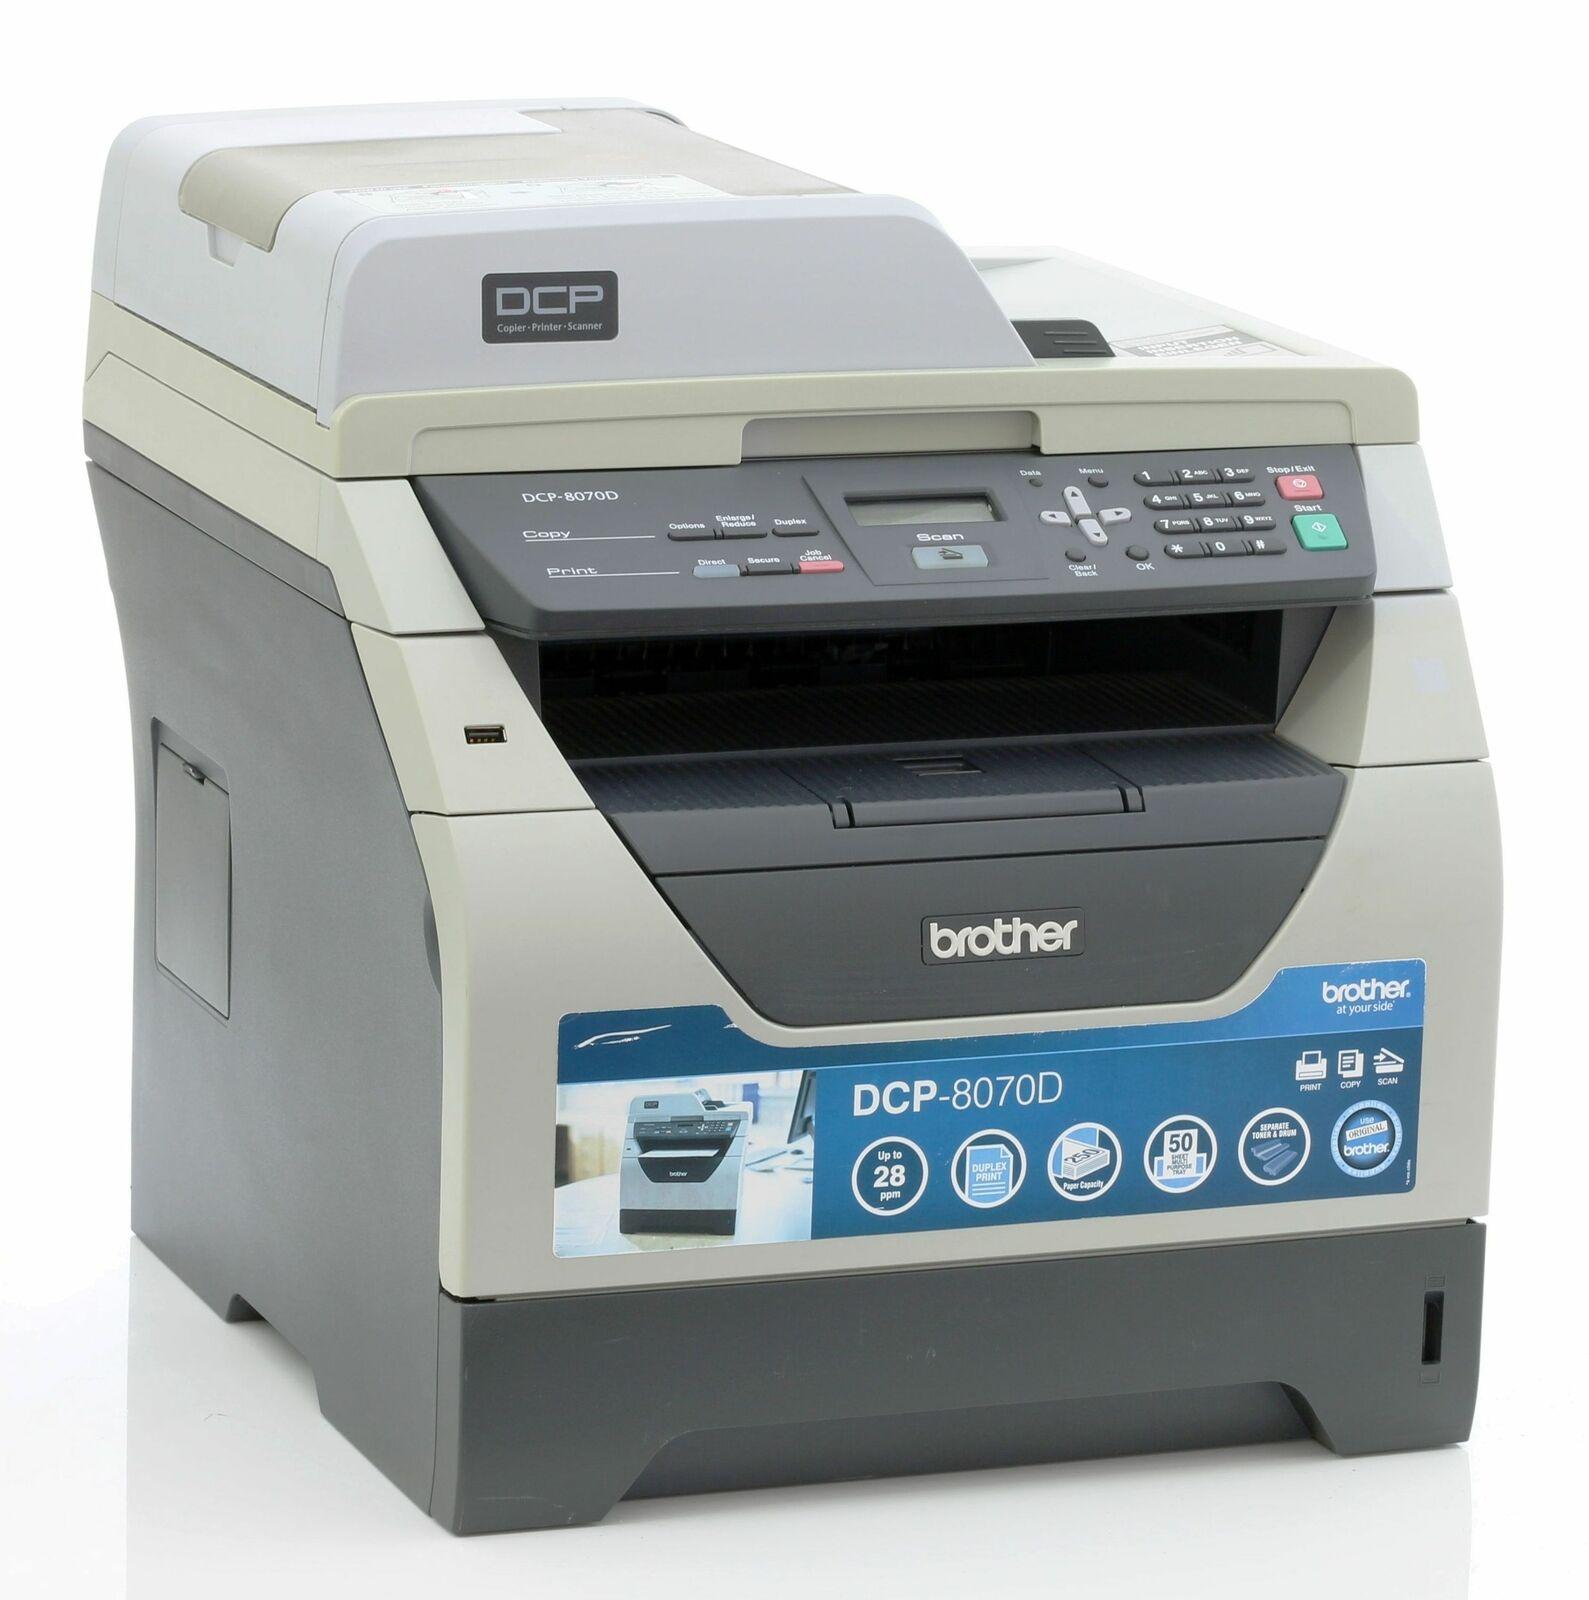 Brother dcp-8070d imprimante laser imprimante scanner photocopieuse utilisé